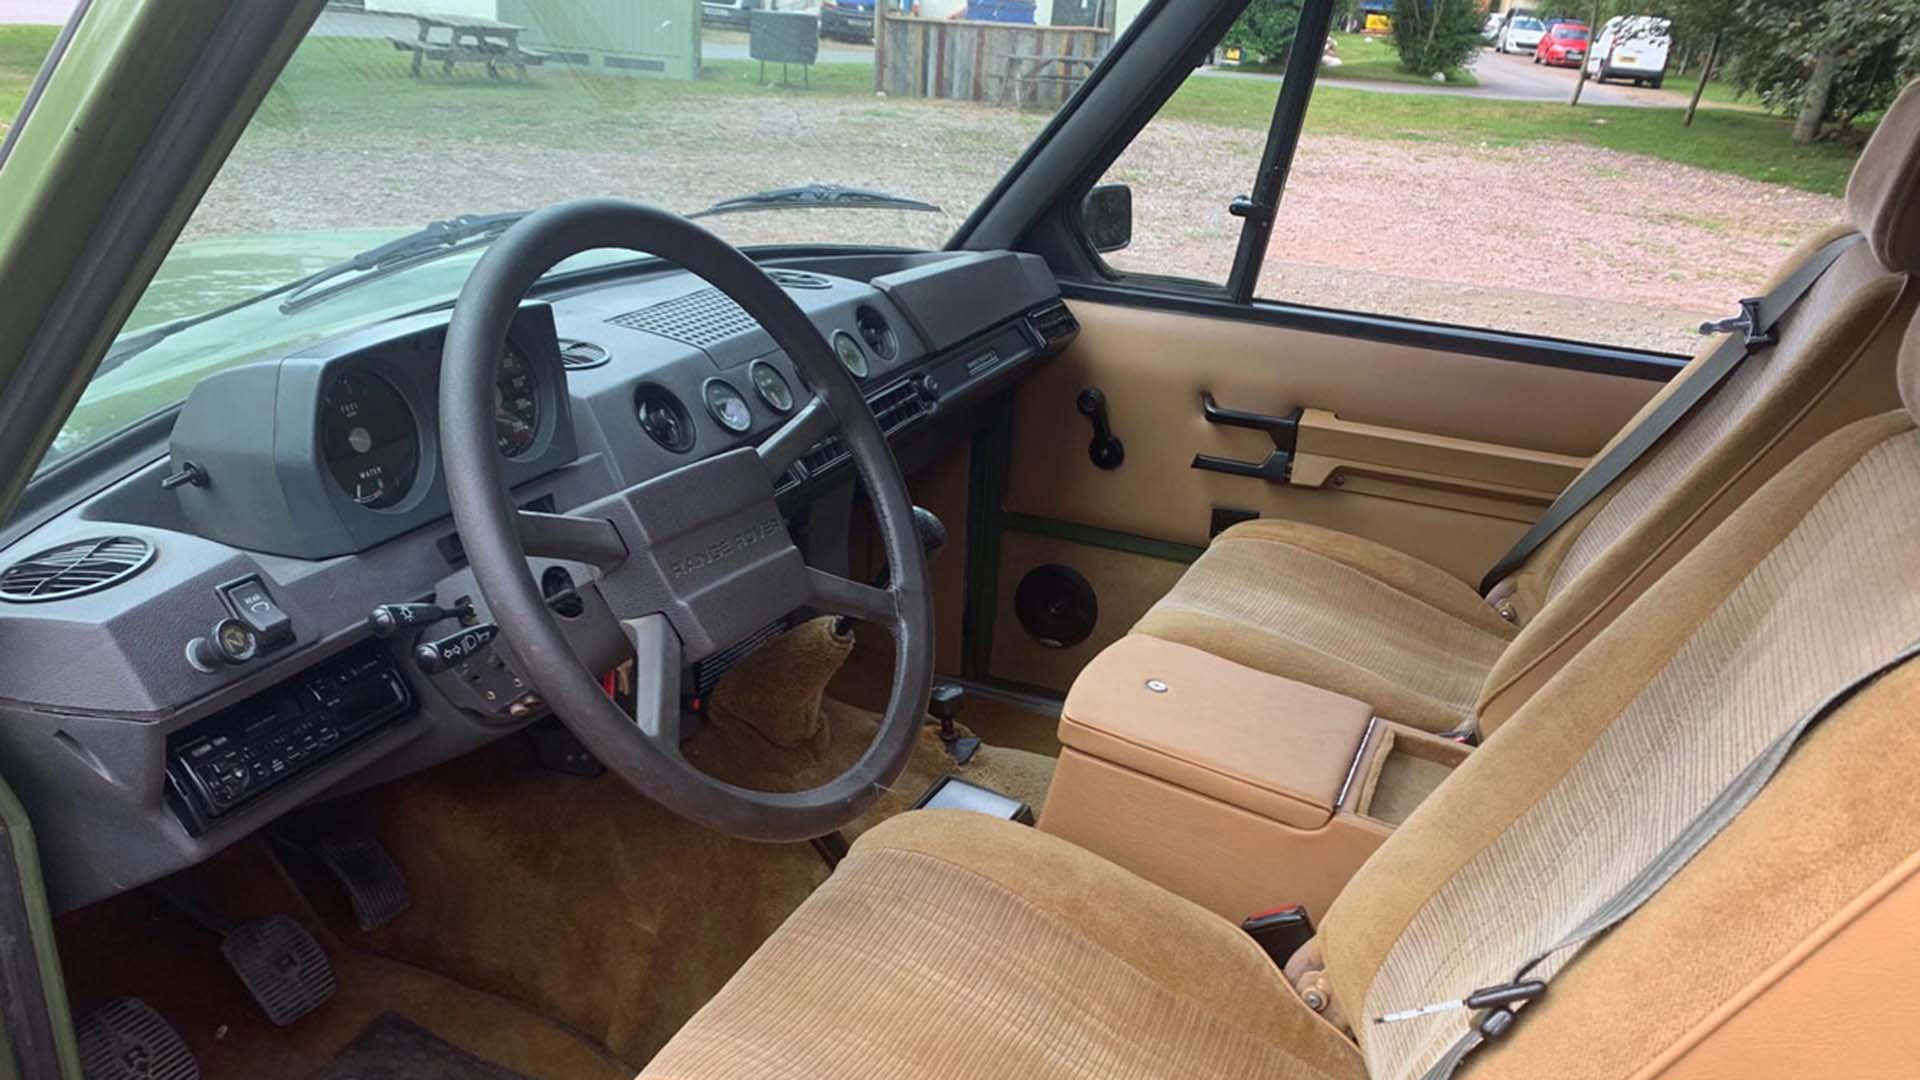 Salvage Hunters Classic Cars Range Rover interior